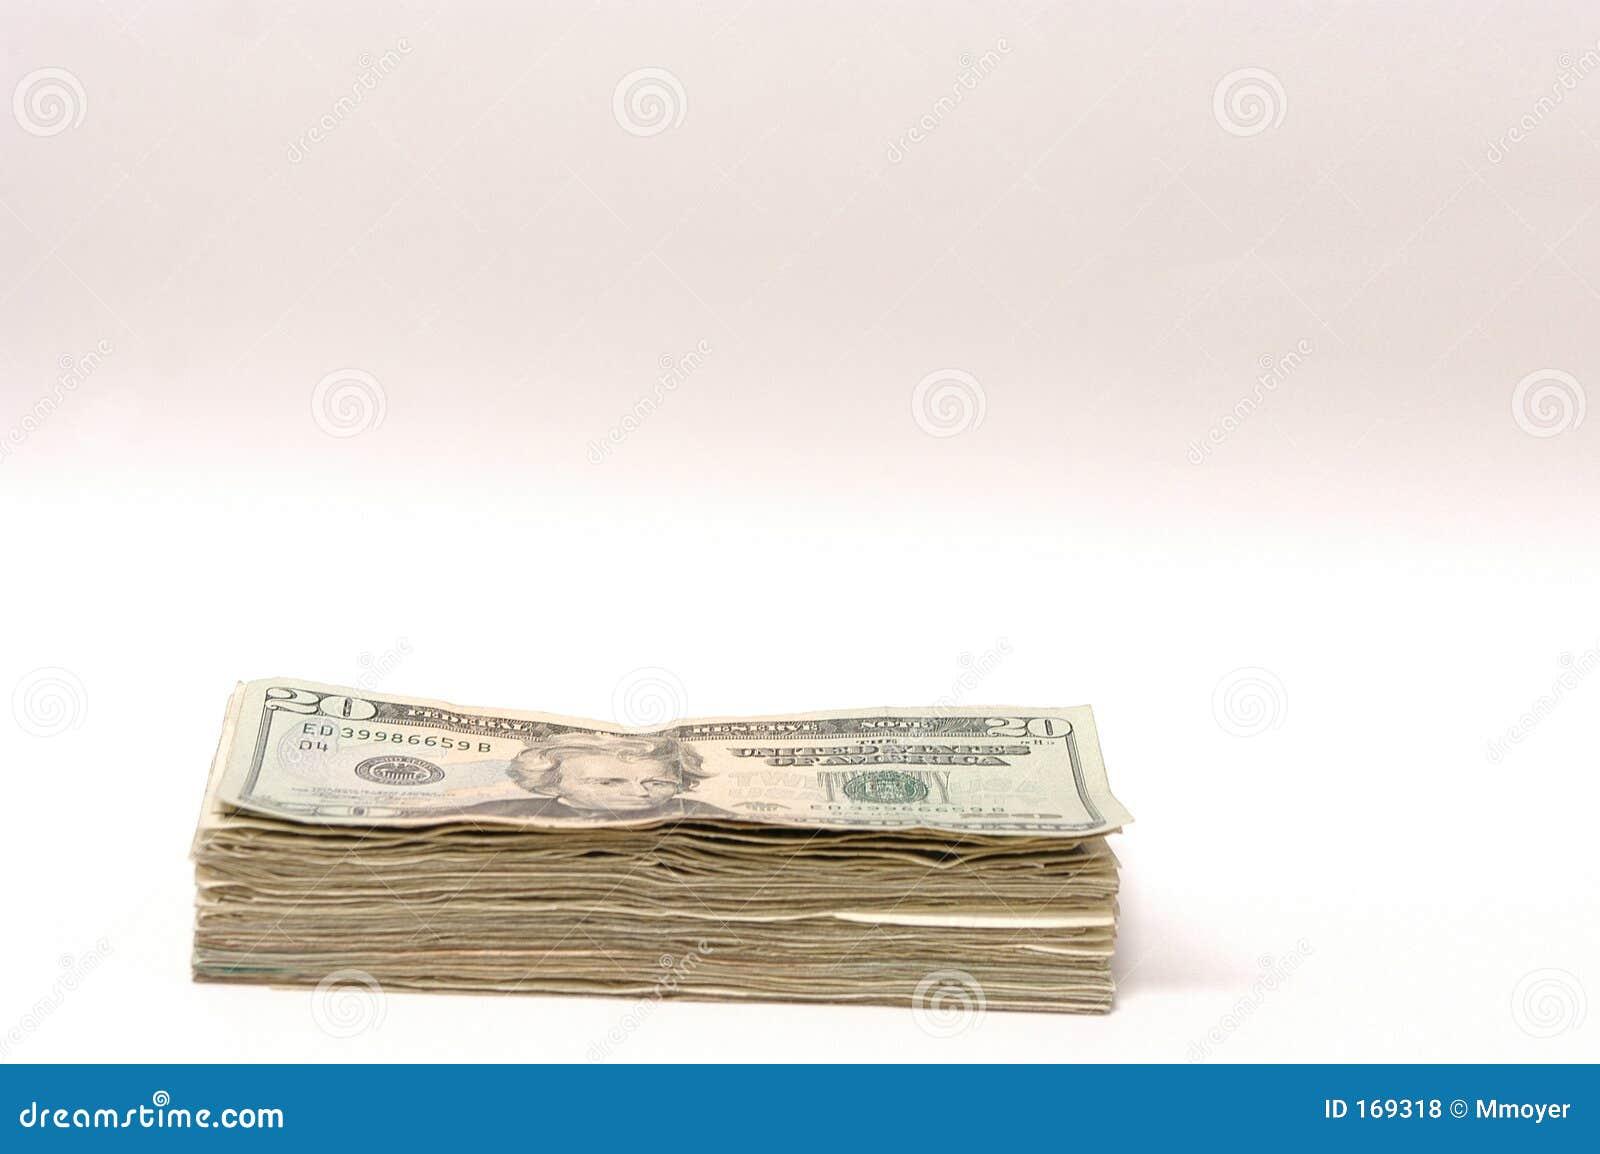 Money ( 20 dollars)